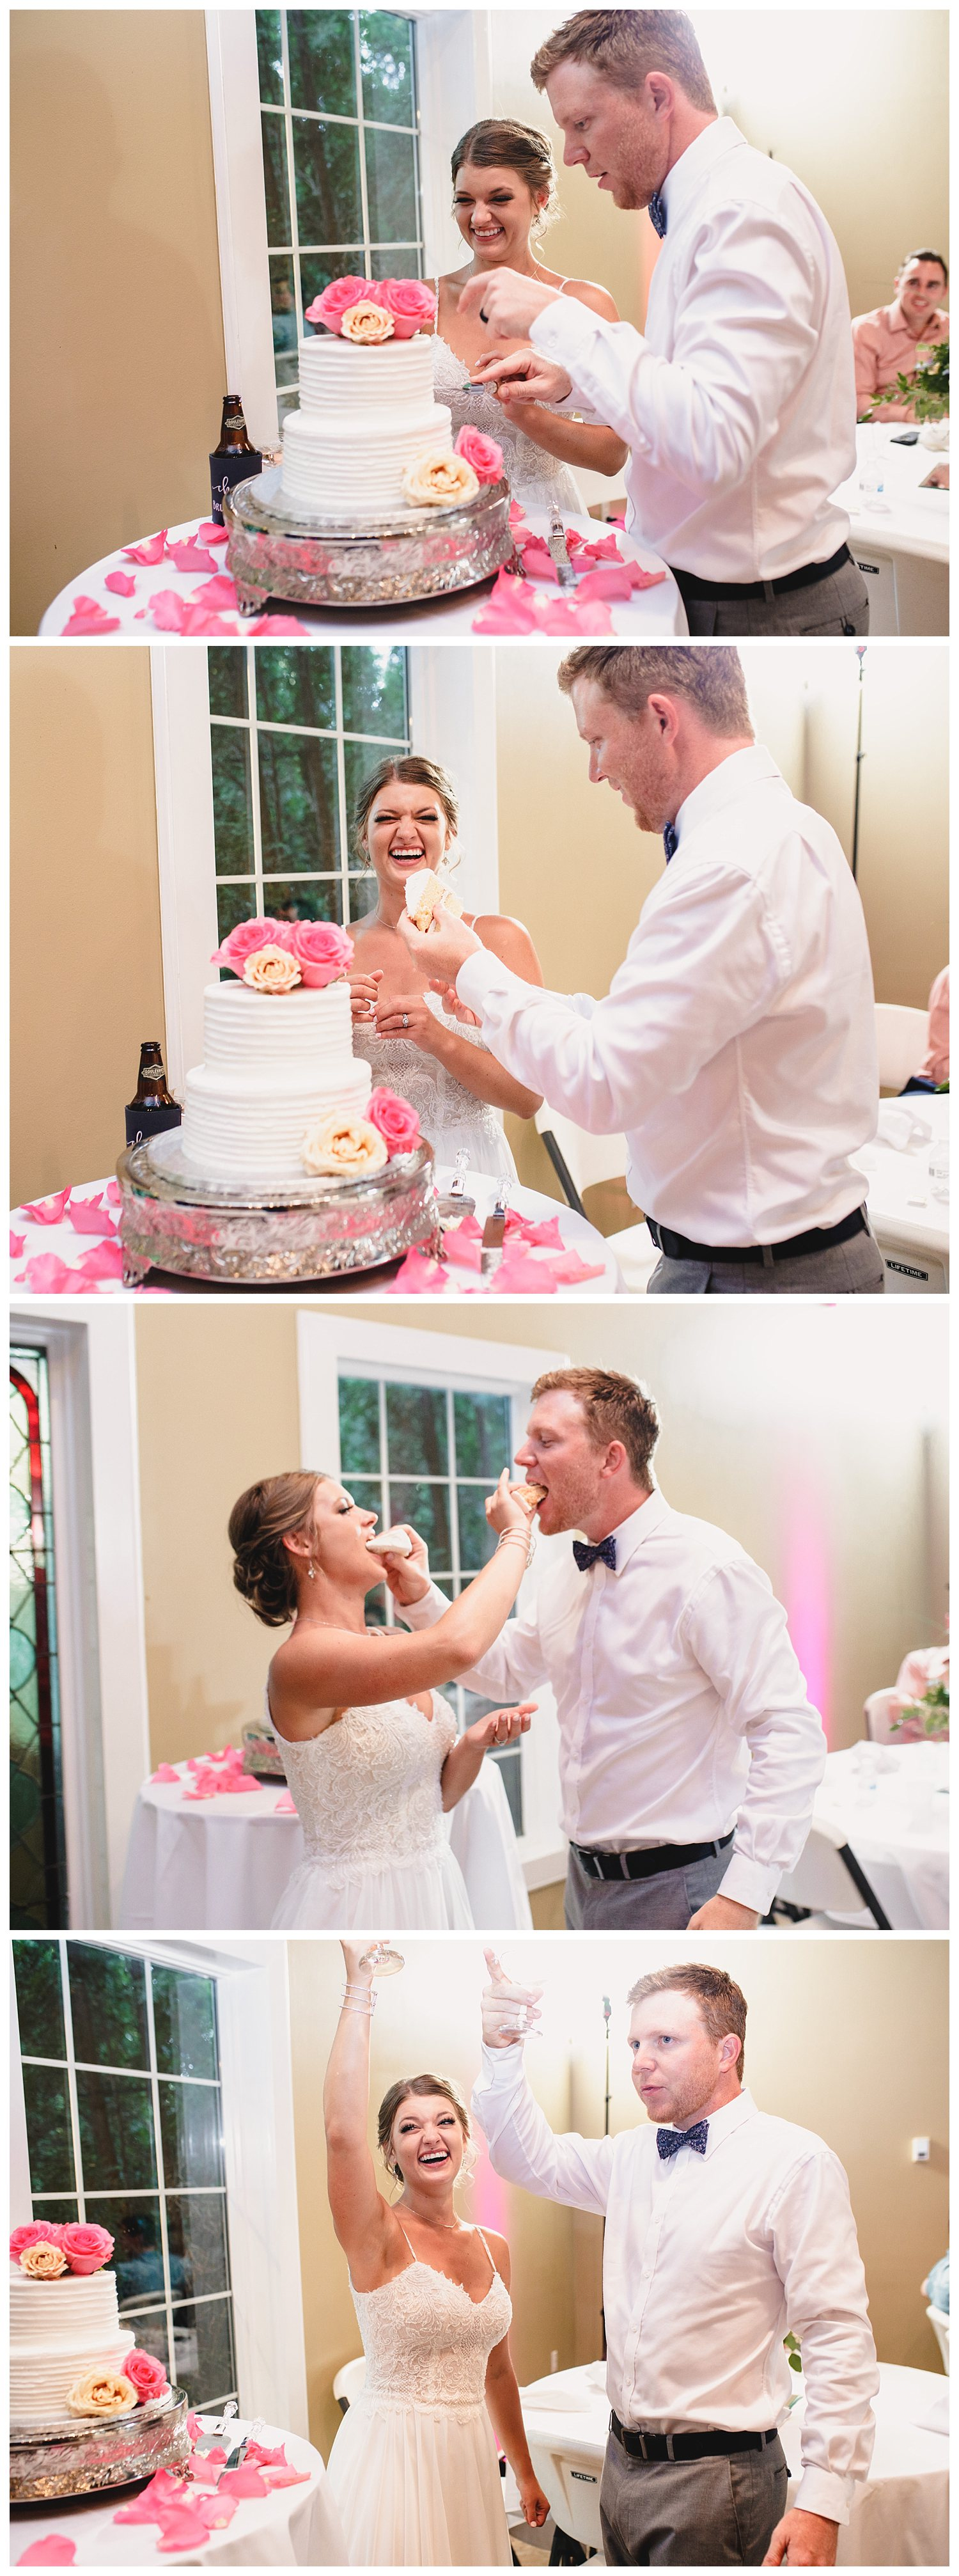 Kelsey_Diane_Photography_Kansas_City_Engagement_Wedding_Photographer_Midwest_Traveling_Missouri_Lee_Andrew_Hall_And_Garden_Blue_Springs_Wedding_Clayton_Kimberly_Summer_Wedding_0844.jpg